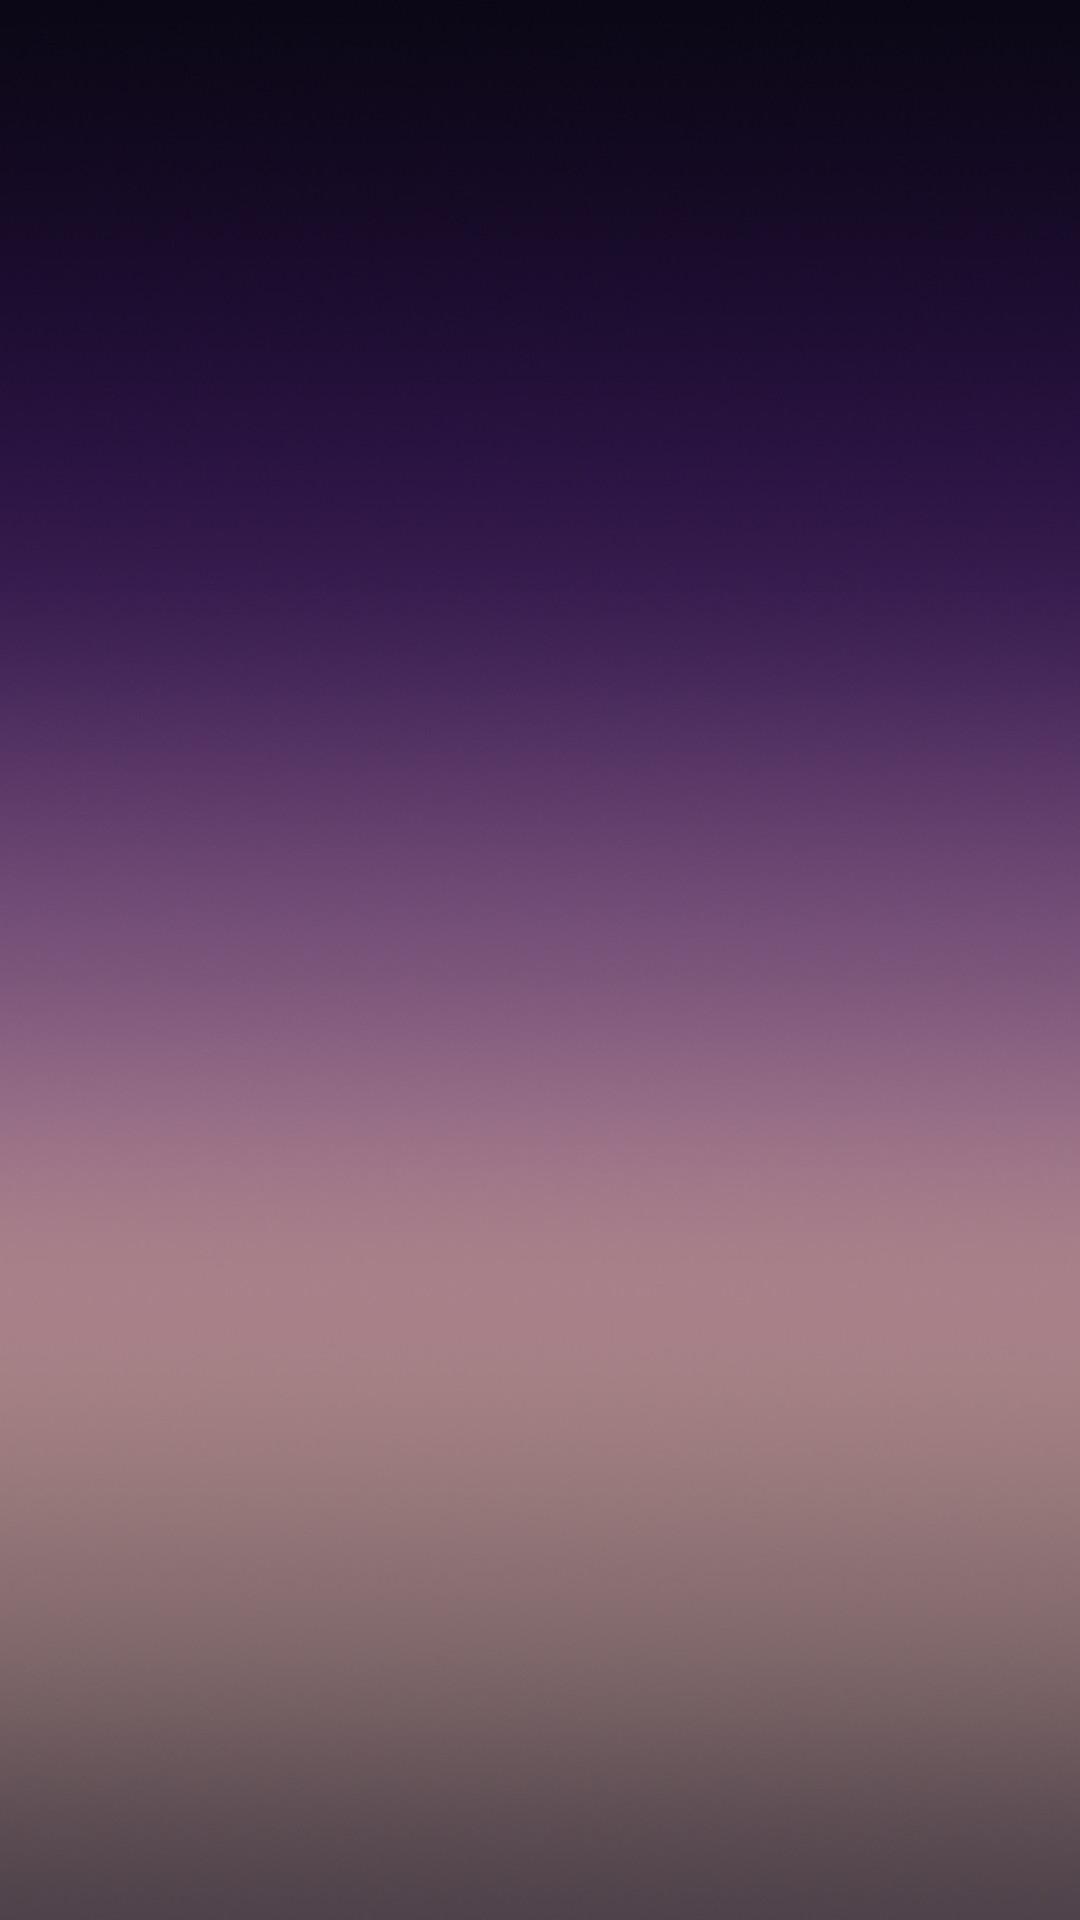 Mauve, wallpaper, galaxy, clean, beauty, colour, peaceful, calming,